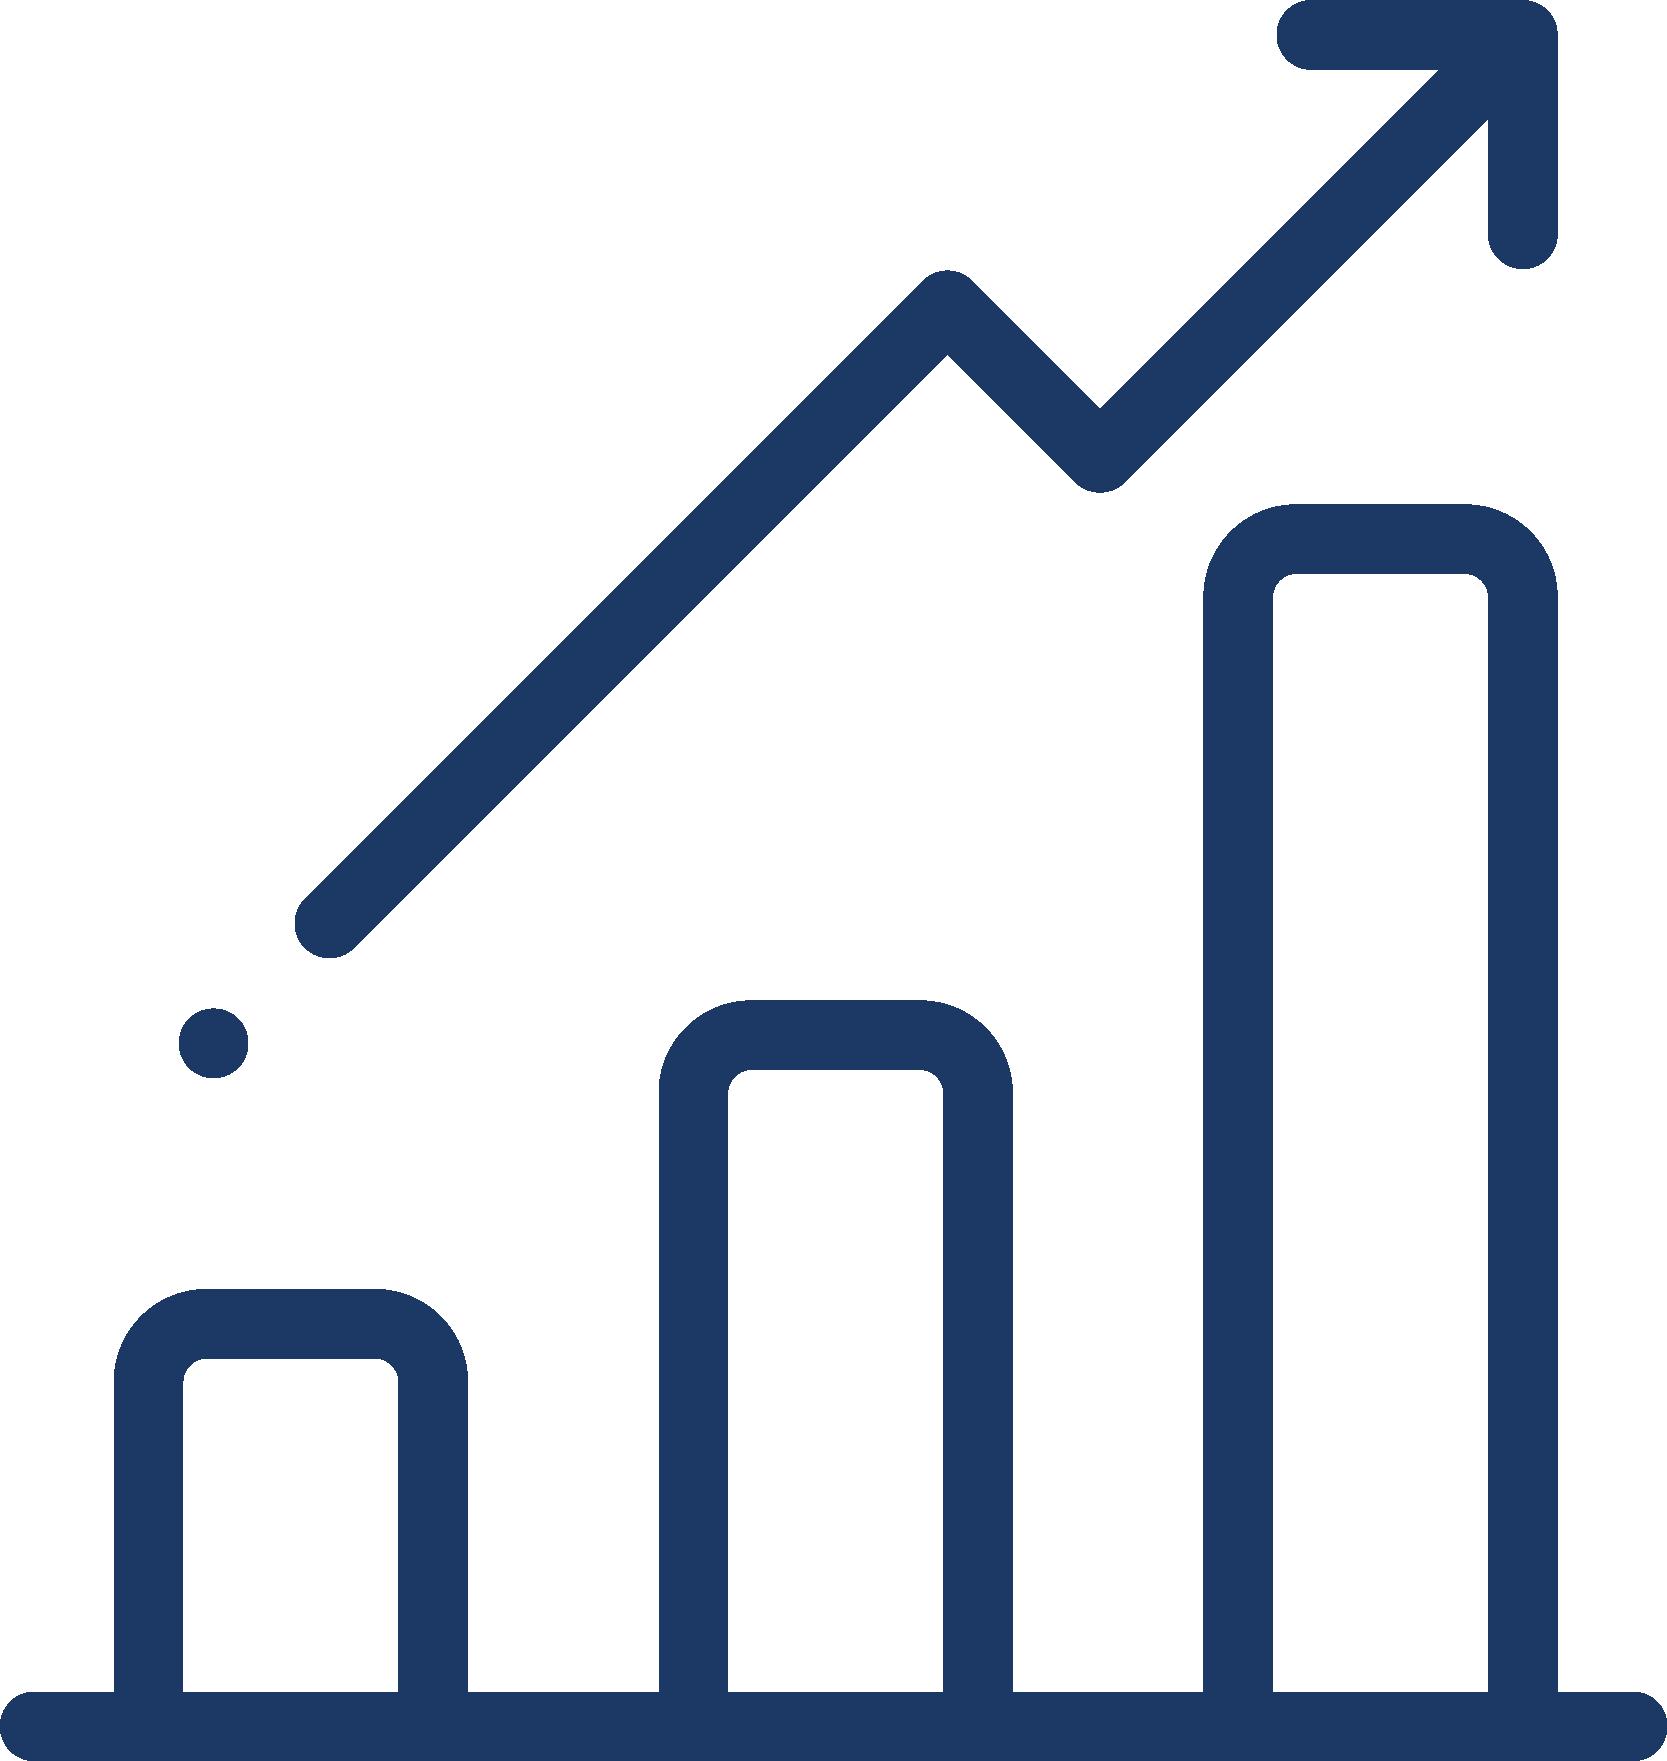 Finance clipart fixed income. Juno financial communications copywriting